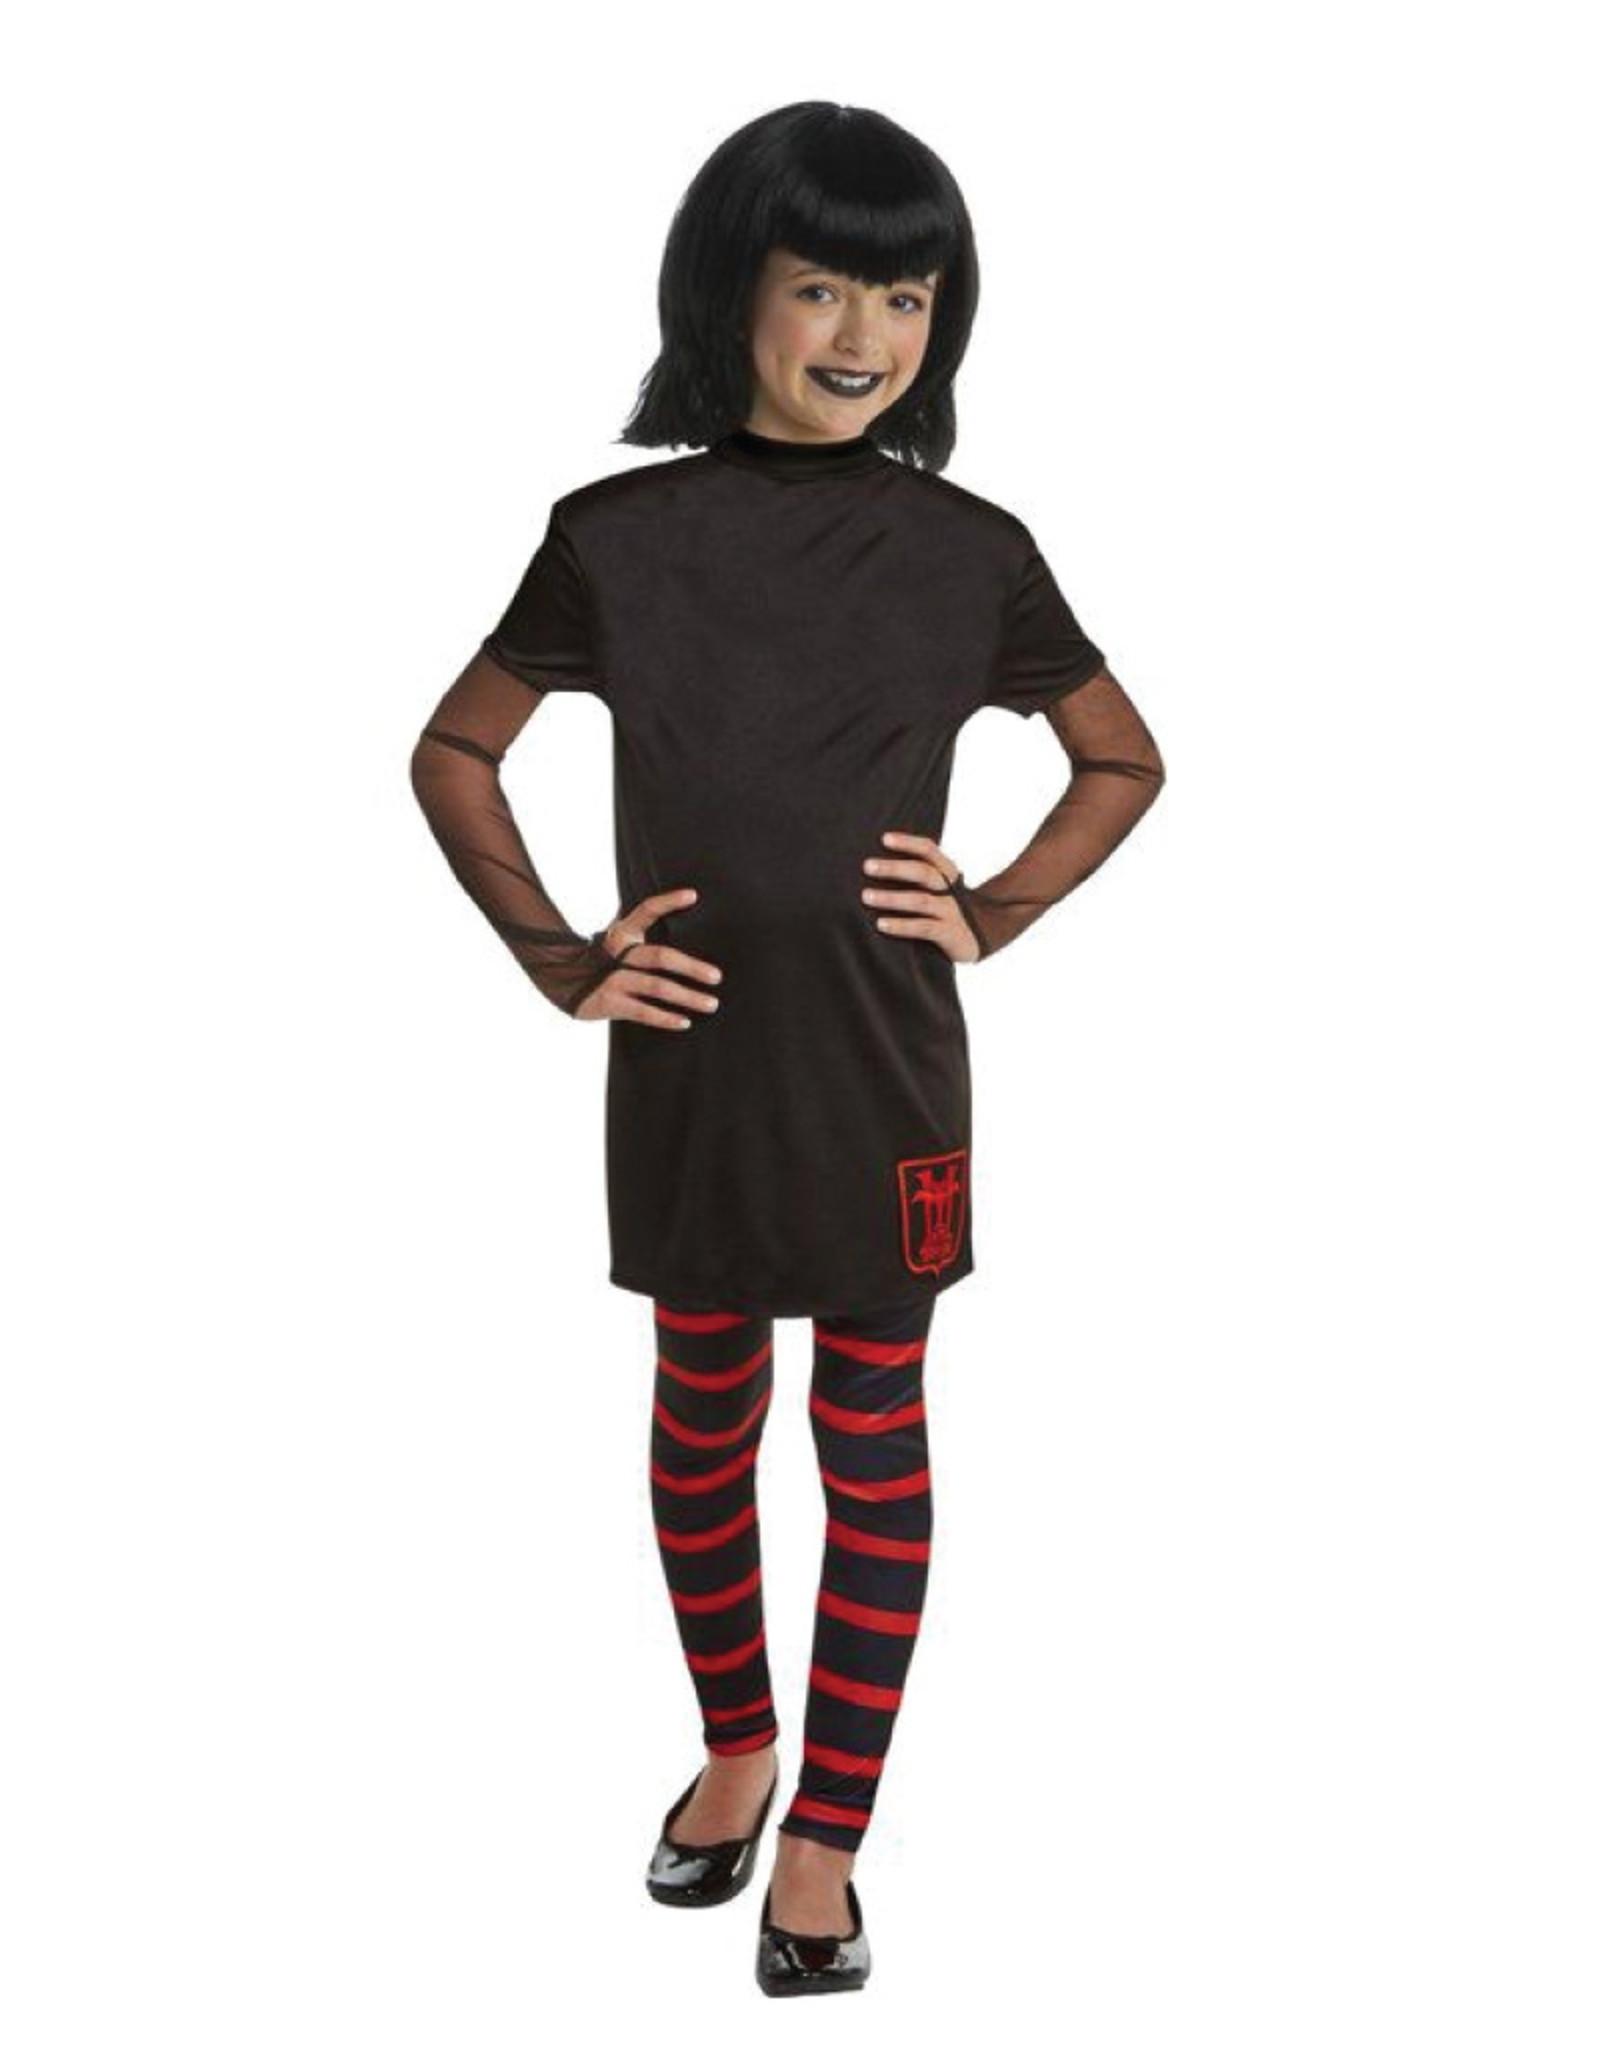 Mavis - Hotel Transylvania Costume - Girls